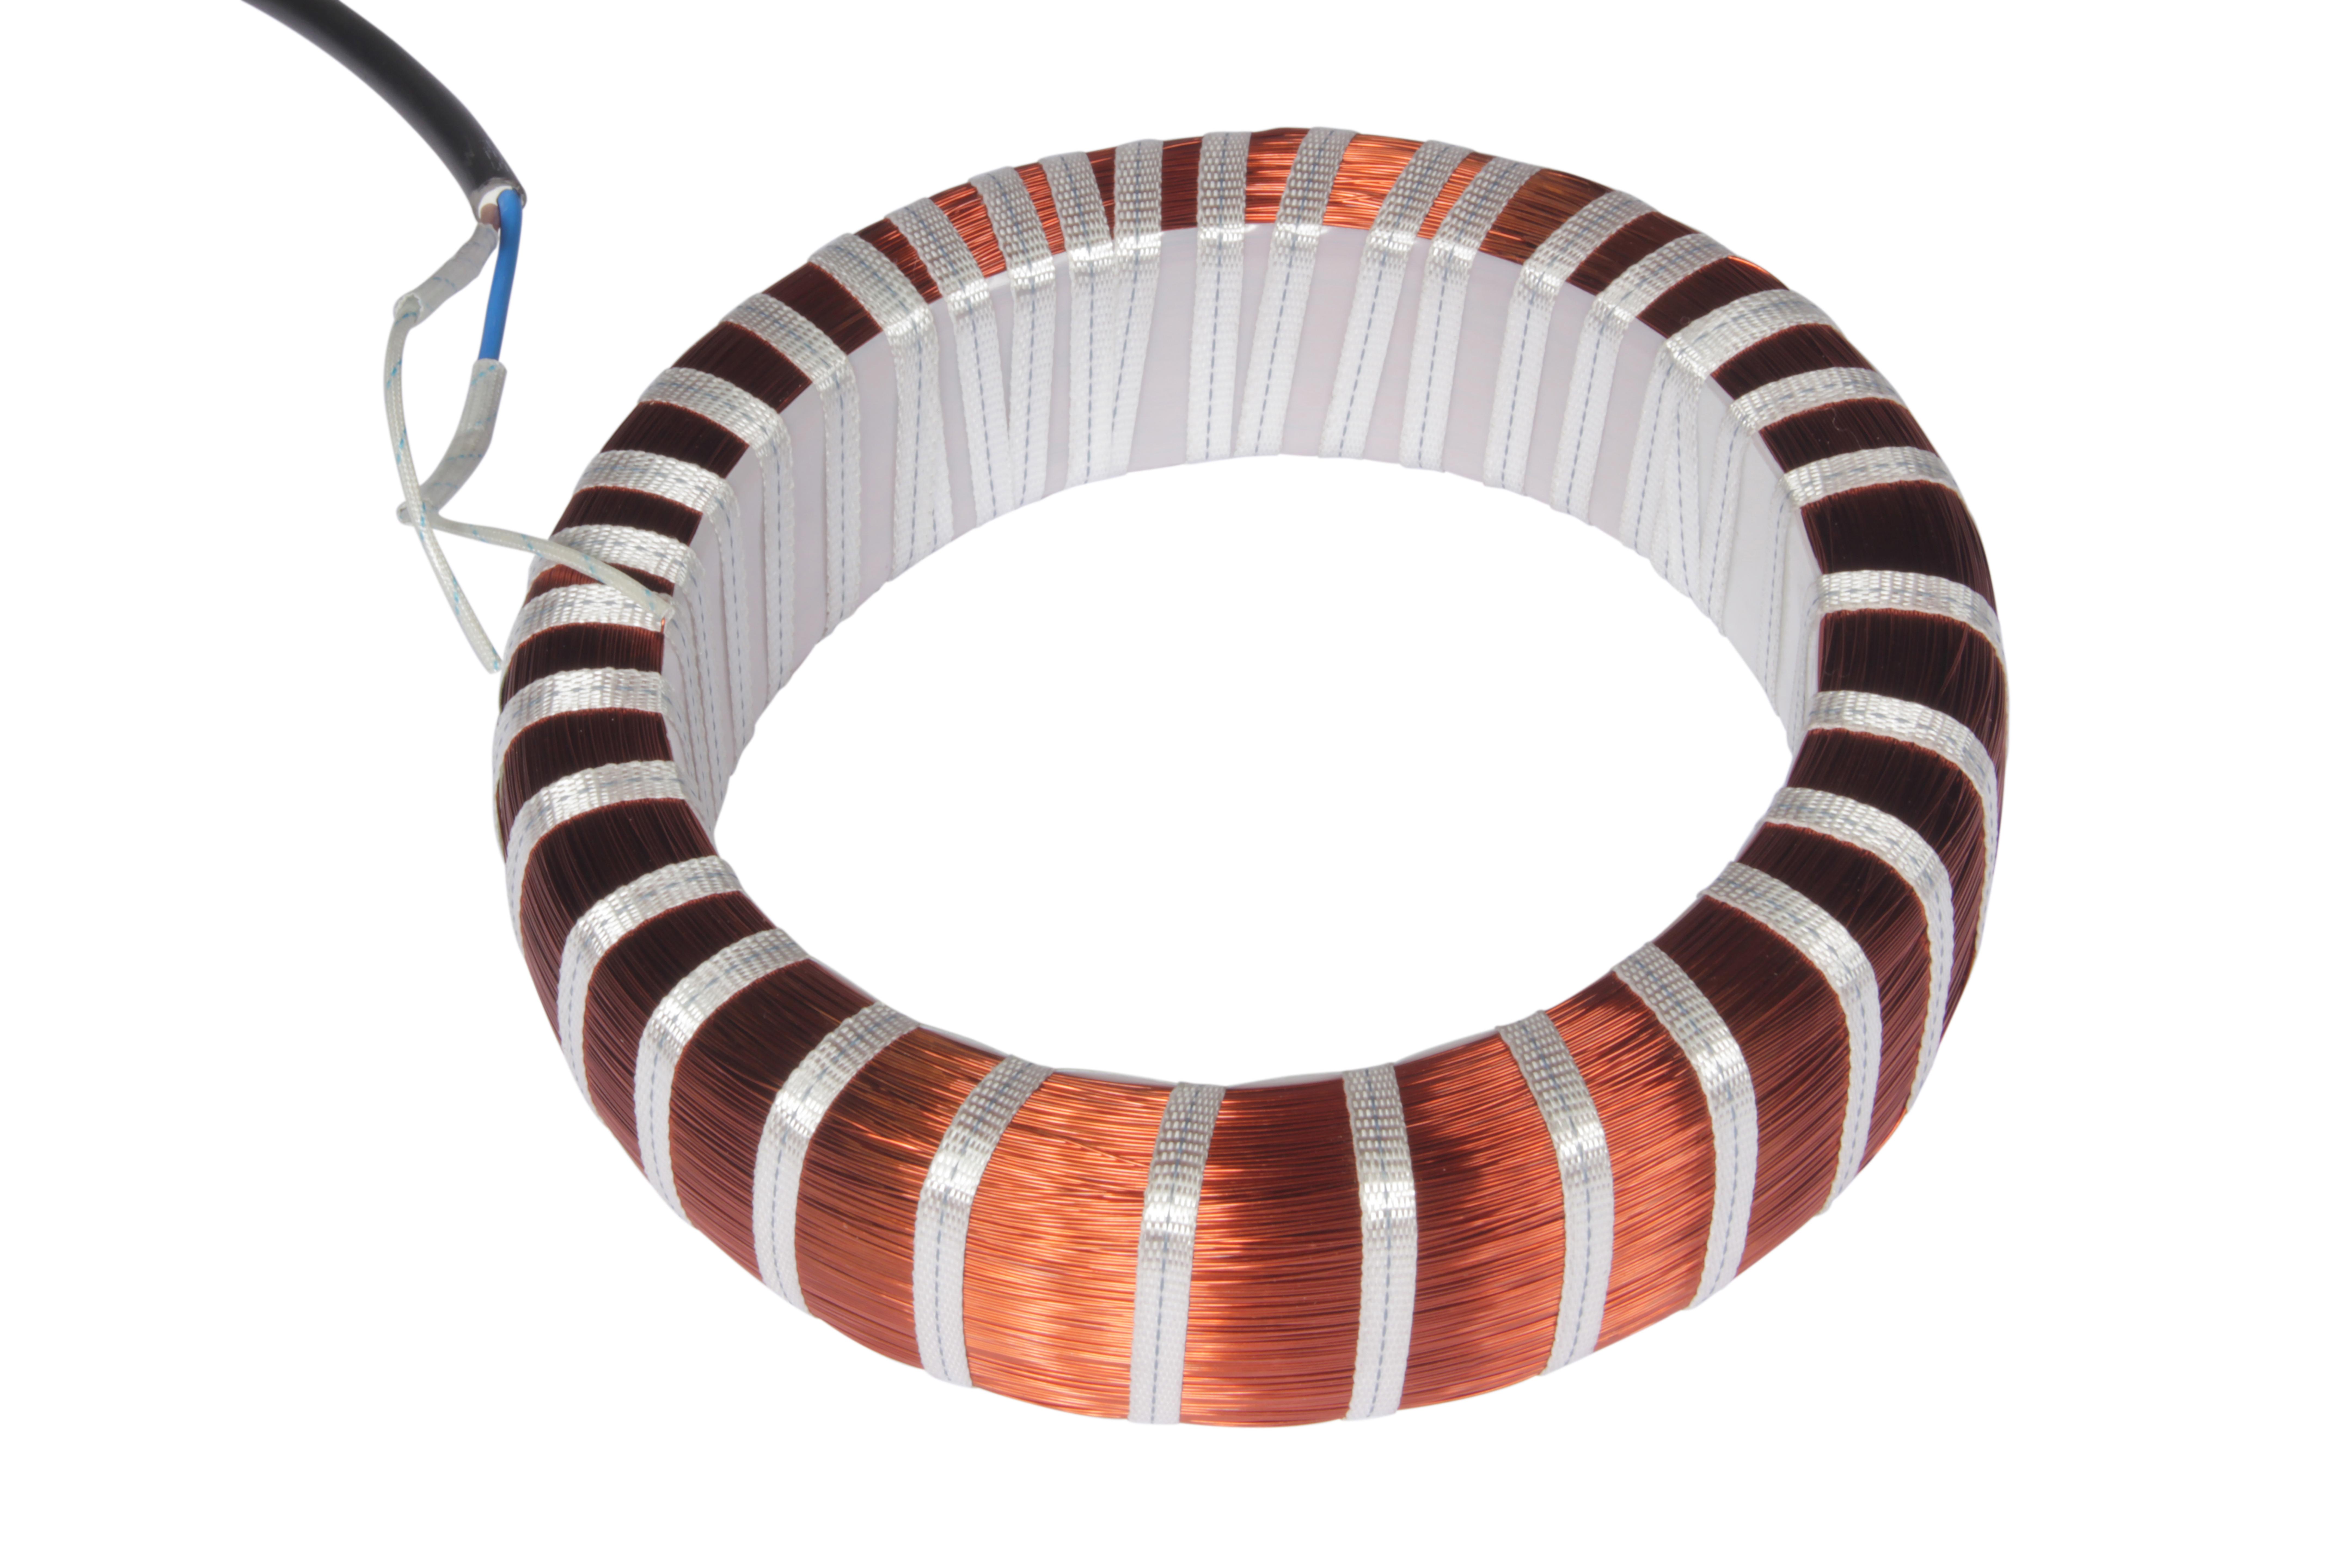 Metallurgy & Nanotechnology